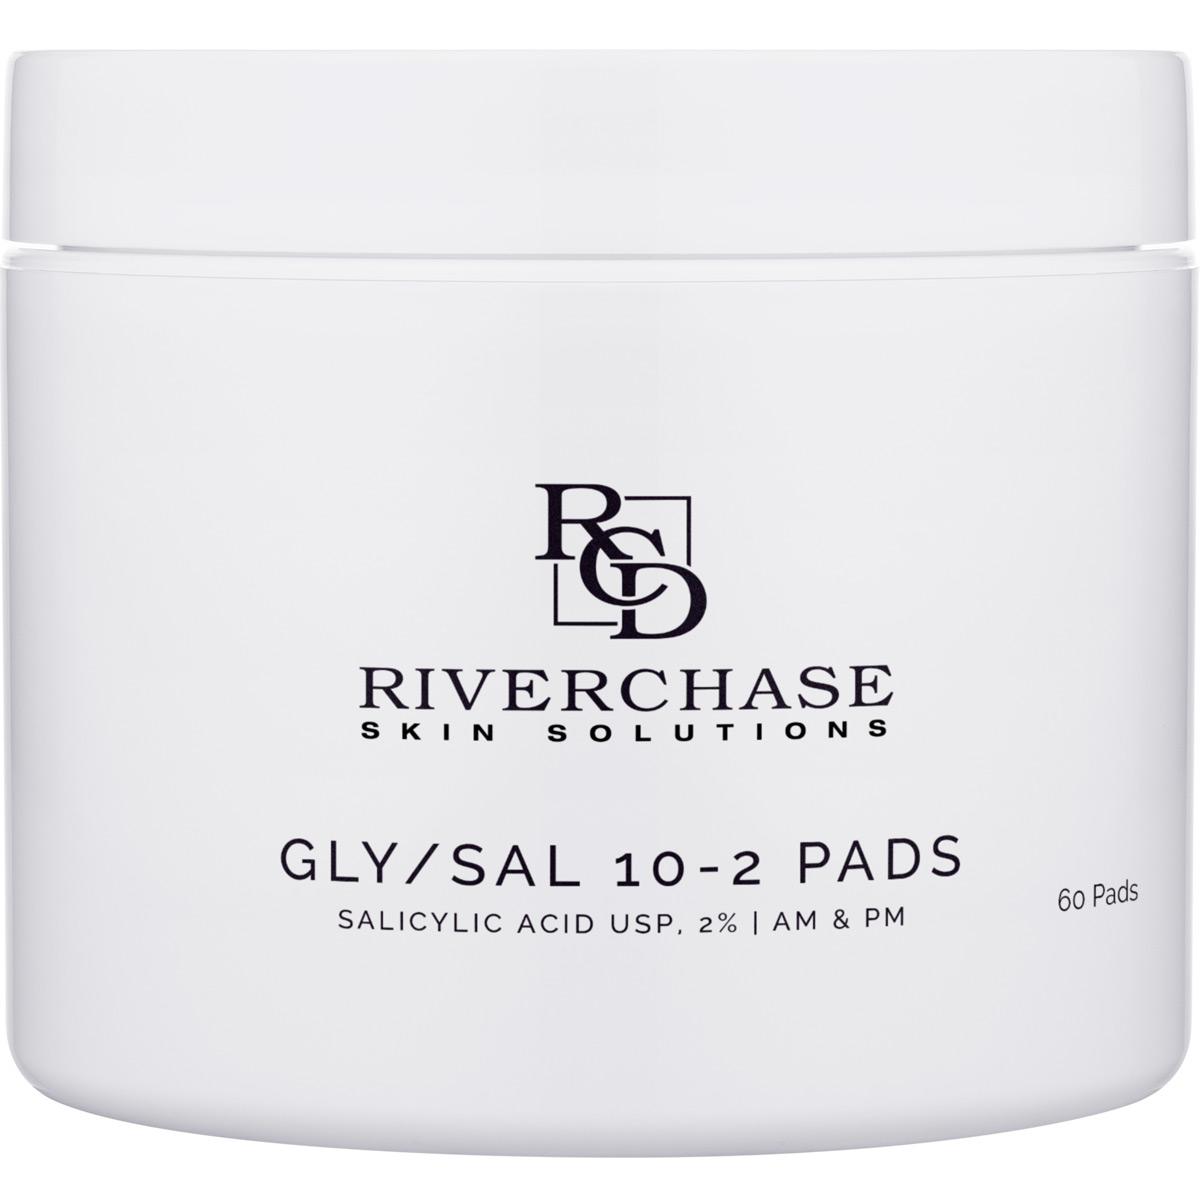 Gly/Sal 10-2 Pads